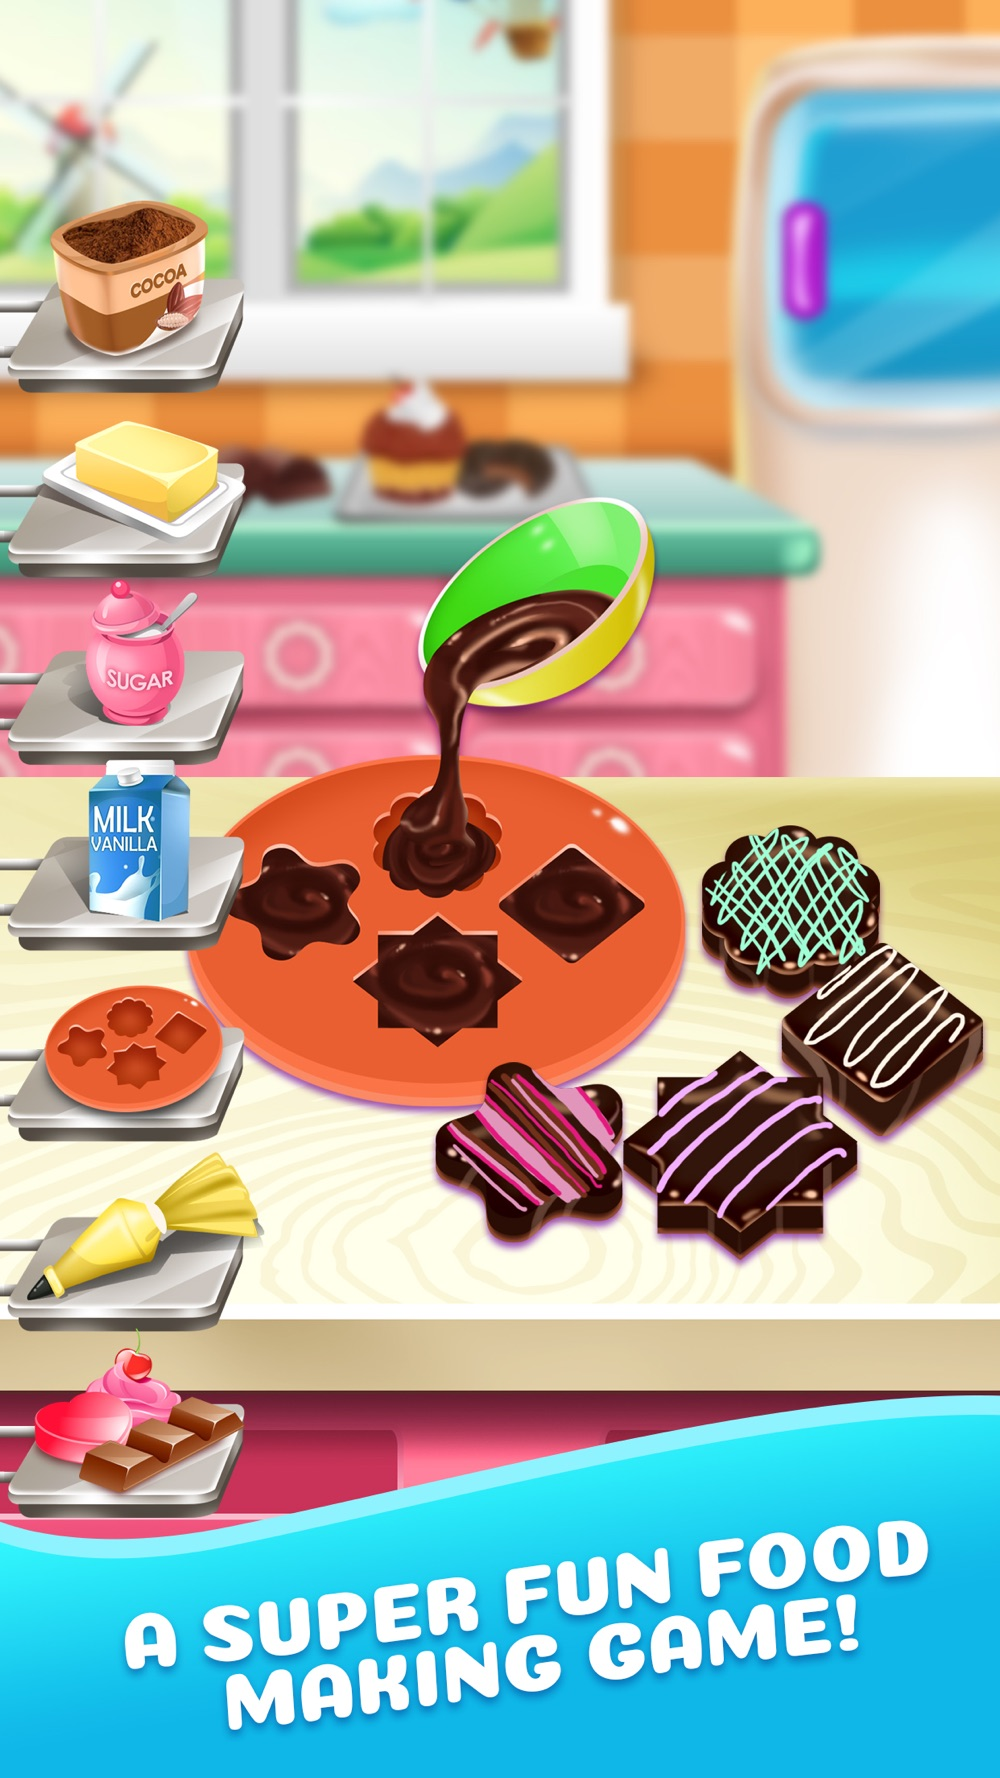 Dessert Food Maker Cooking Kids Game Cheat Codes